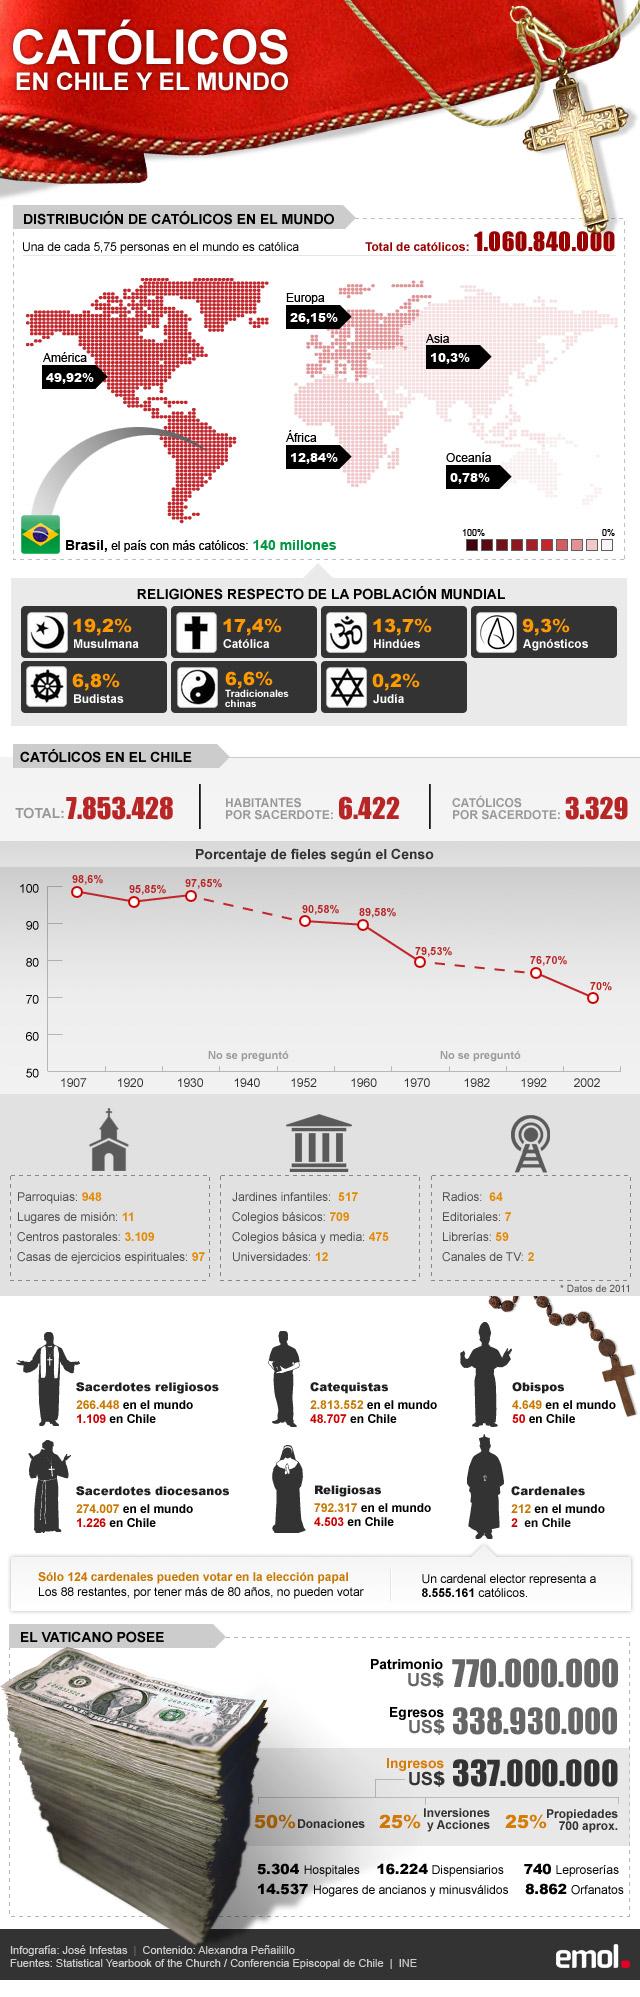 Infografía: Cifras de la Iglesia Católica